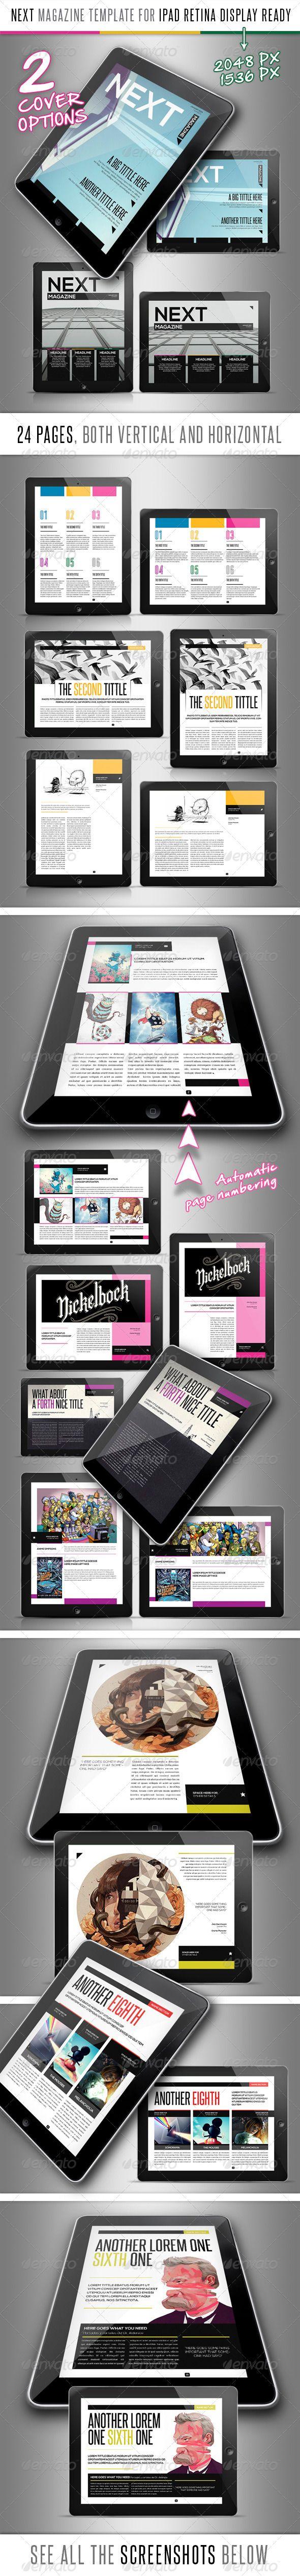 Next MGZ Tablet Version - Digital Magazines ePublishing